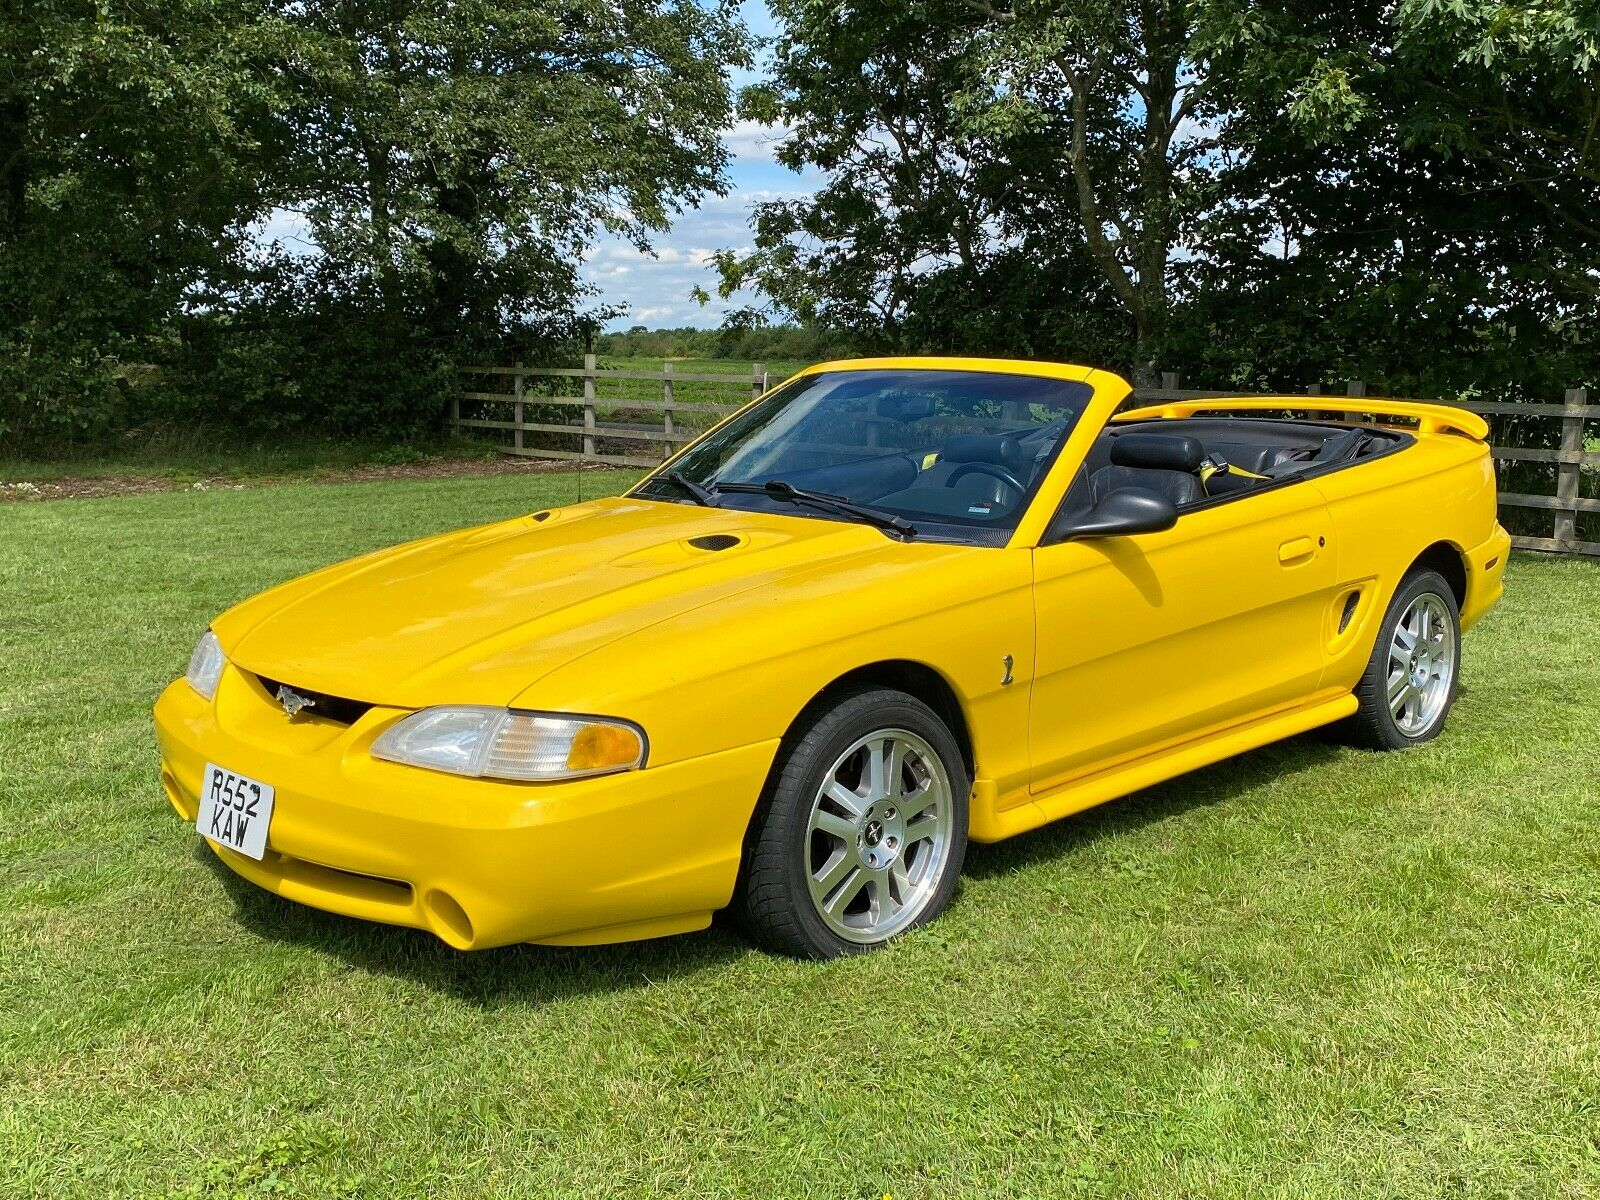 SVT-Cobra-Ford-Mustang-Convertible-1998-LHD-UK-Registered